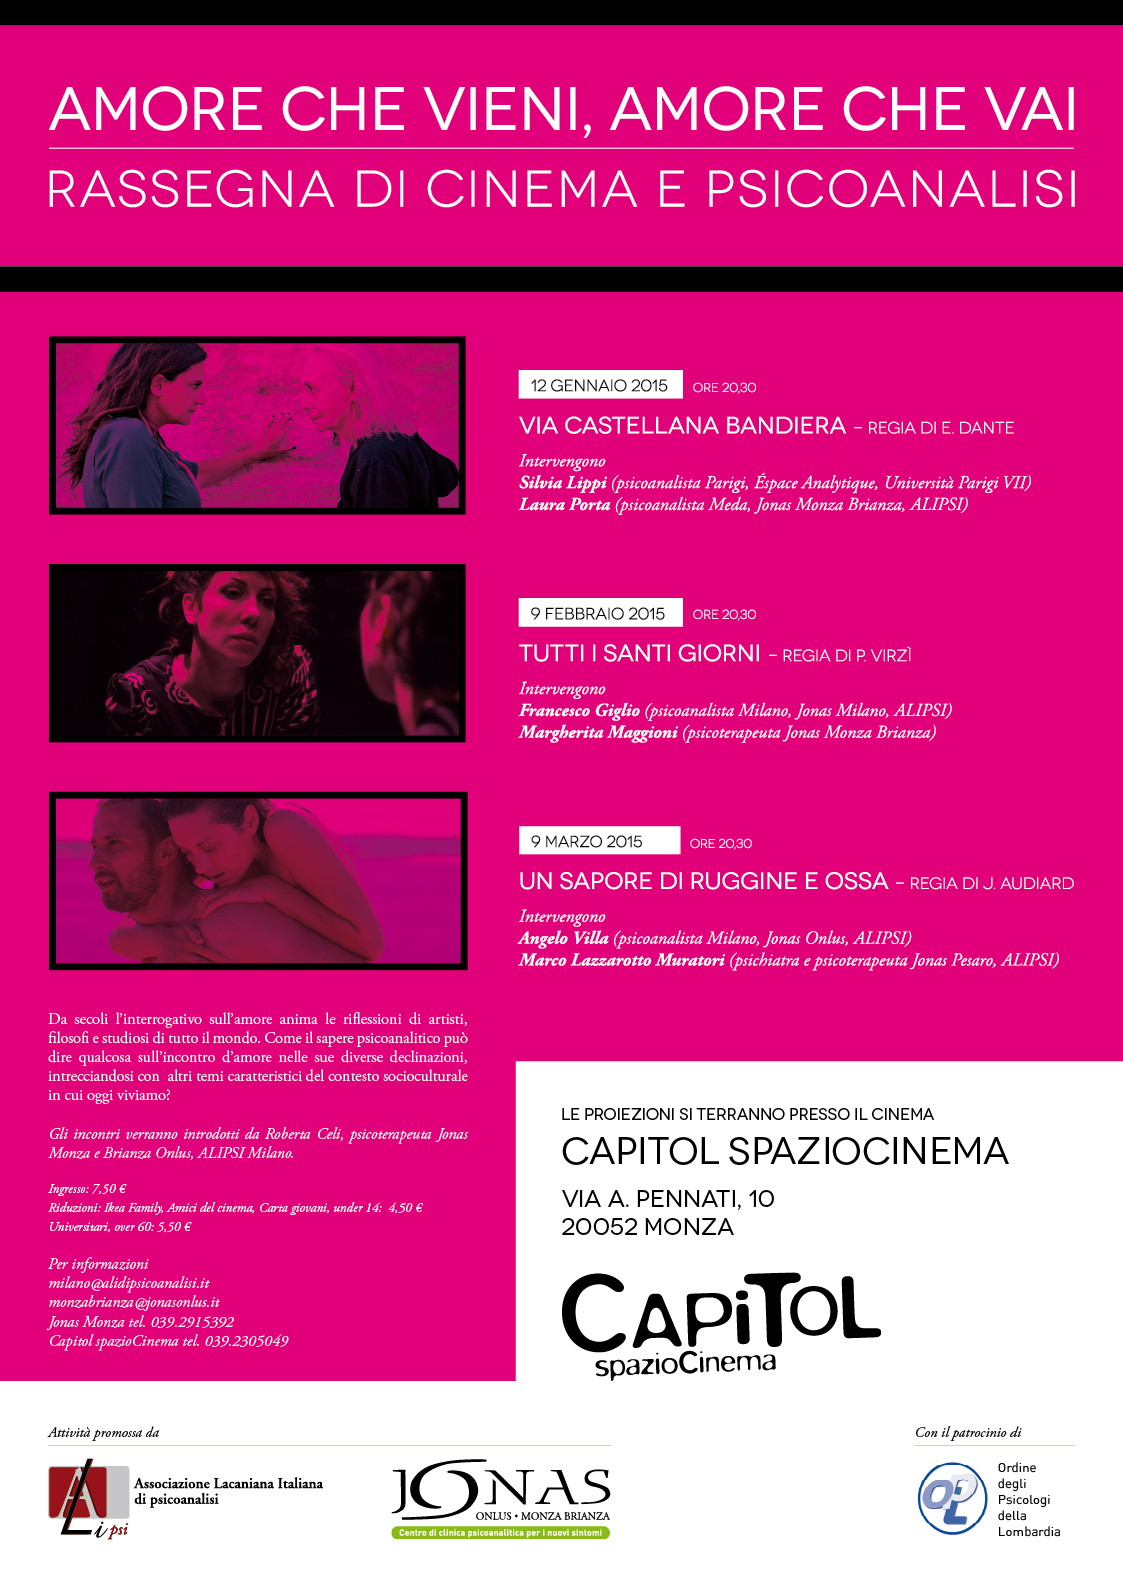 cinema-e-psicoanalisi-2015